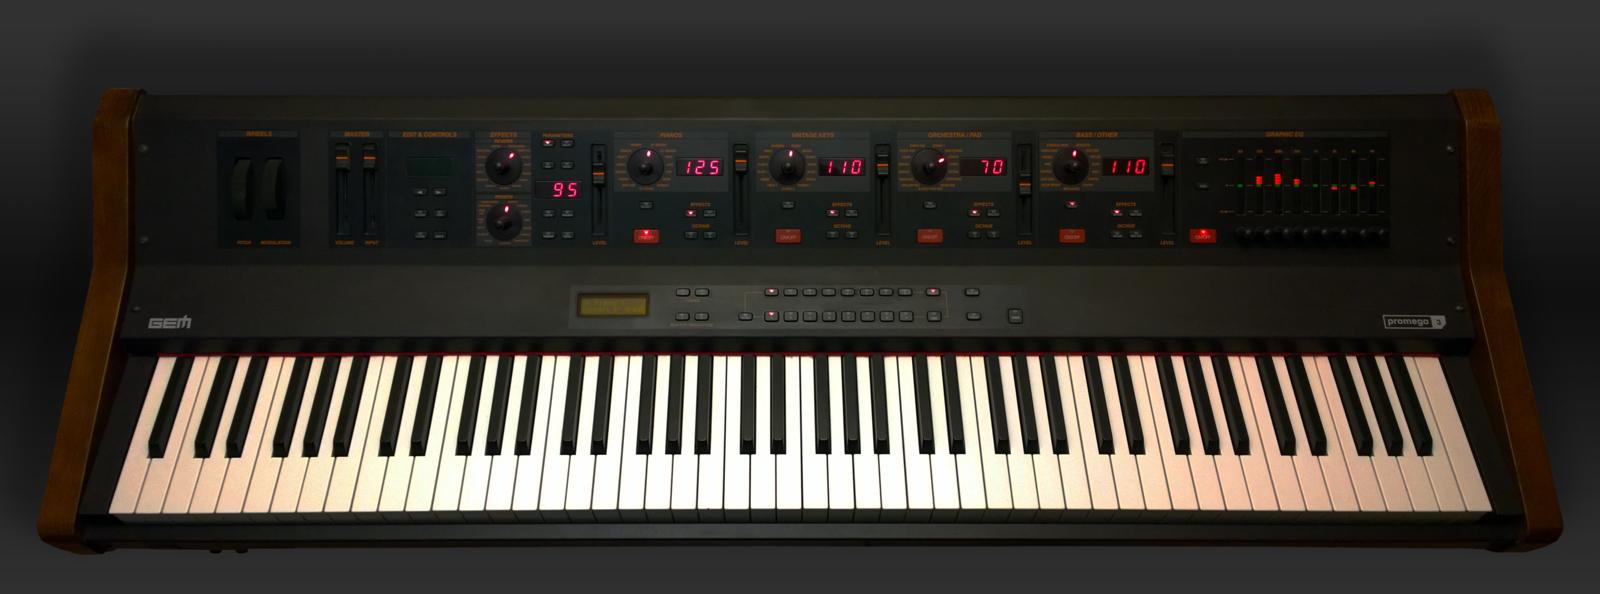 File:GEM Promega 3 (digital piano) jpg - Wikimedia Commons